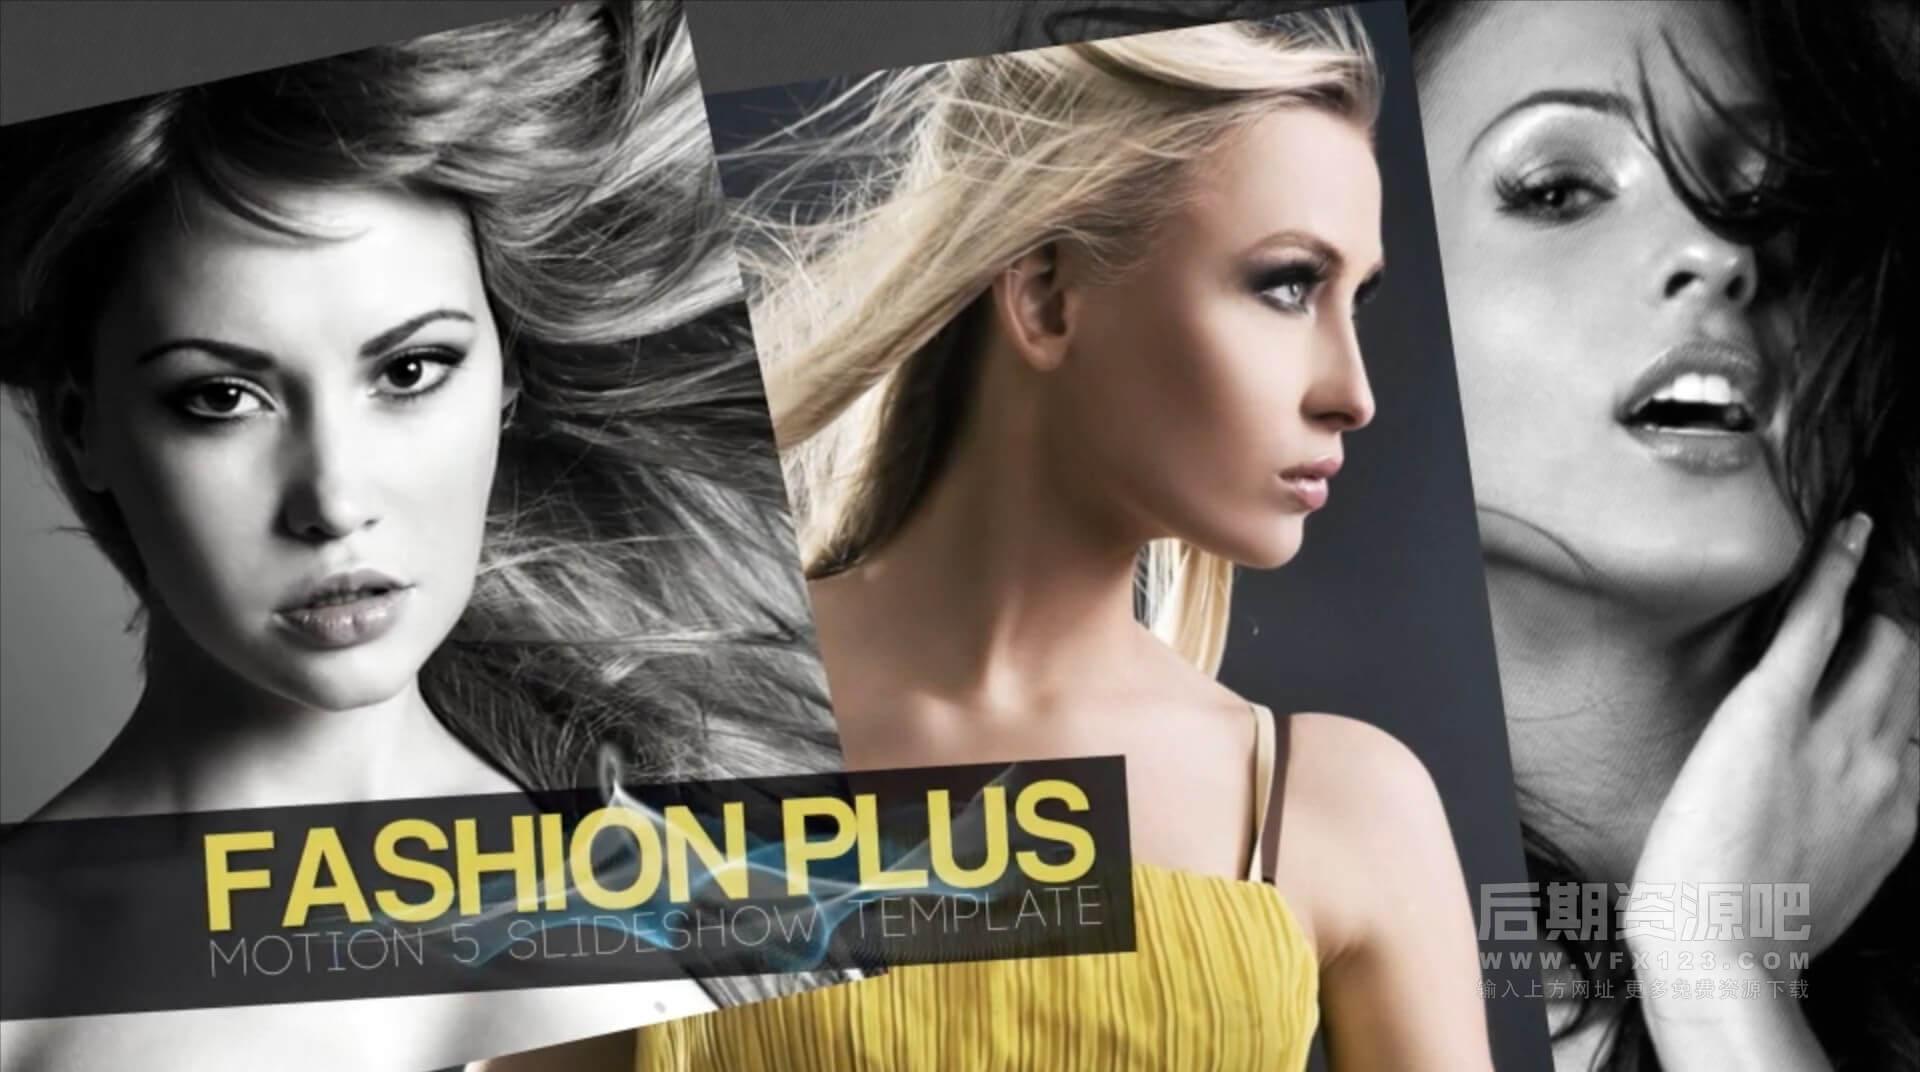 Motion模板 时尚个人写真图片视频展示片头模板 Fashion Plus